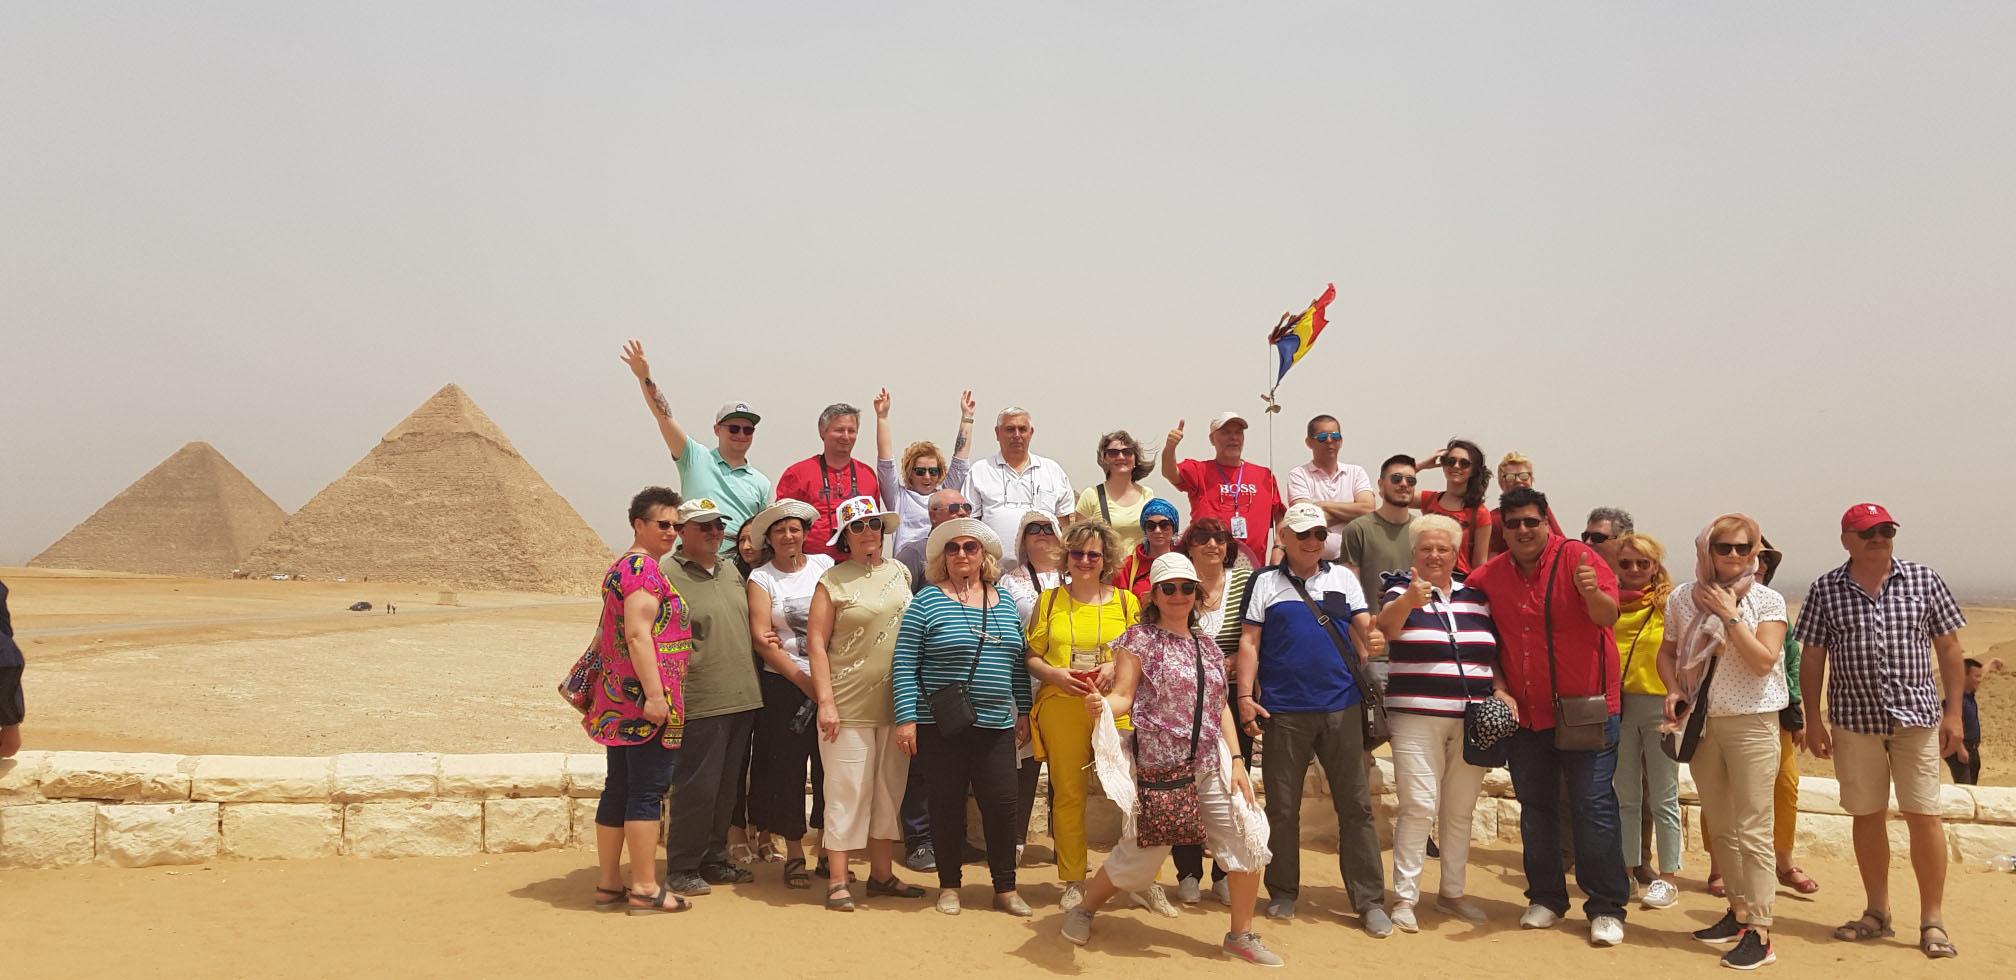 Egipt Platoul Giza